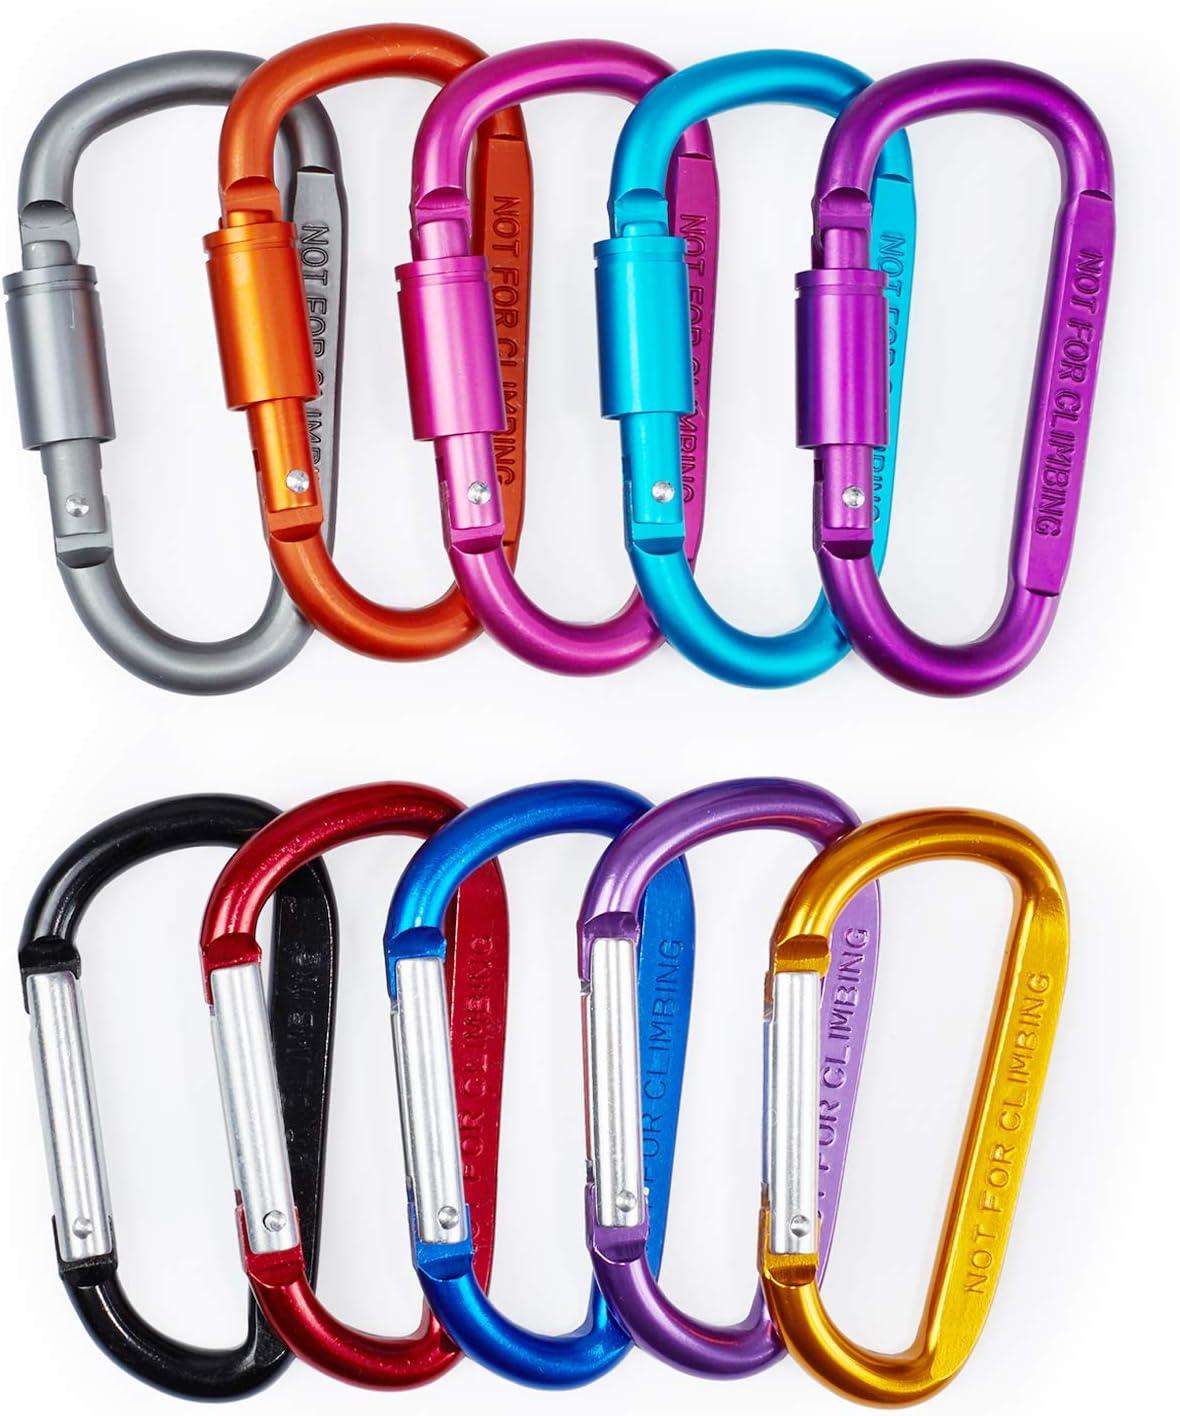 "MODENGKONGJIAN Aluminum Carabiner D Shape Buckle Pack, Keychain Clip, Spring Snap Hook Screw Gate Buckle, 3"" D-Ring Locking Key, Camping Climbing Hiking Keychain (10 PCS)"